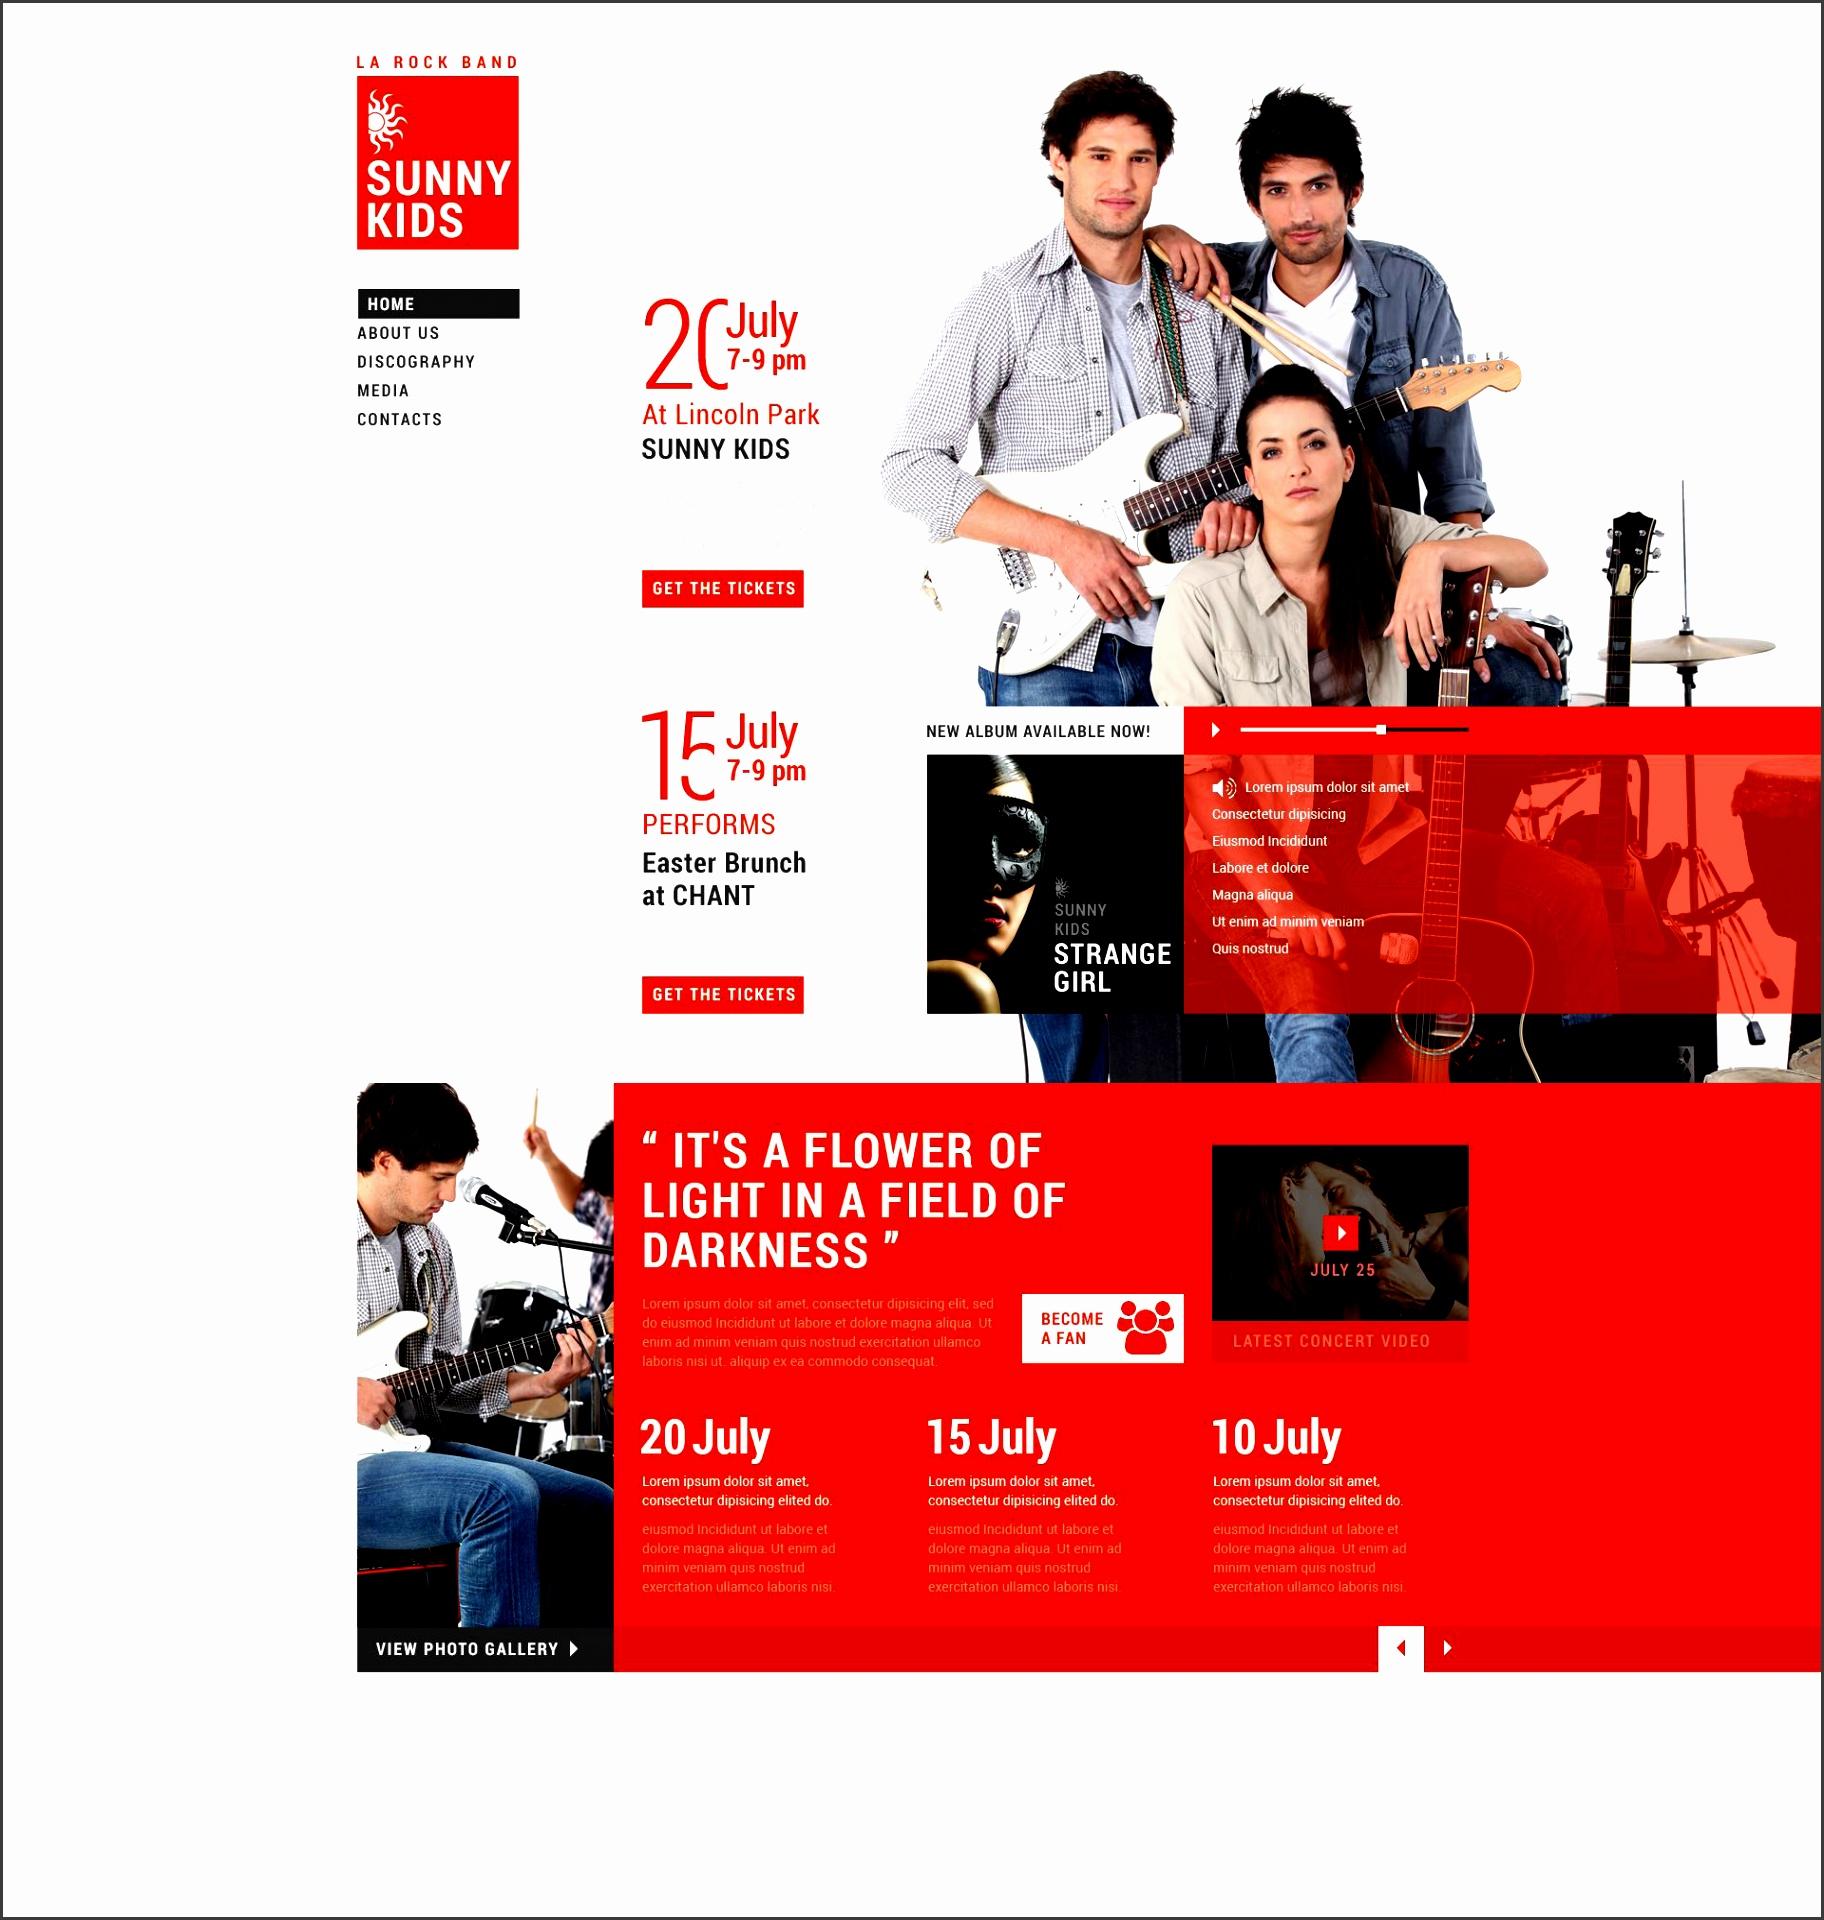 website design template best music band university school biography sounds track cd album photos